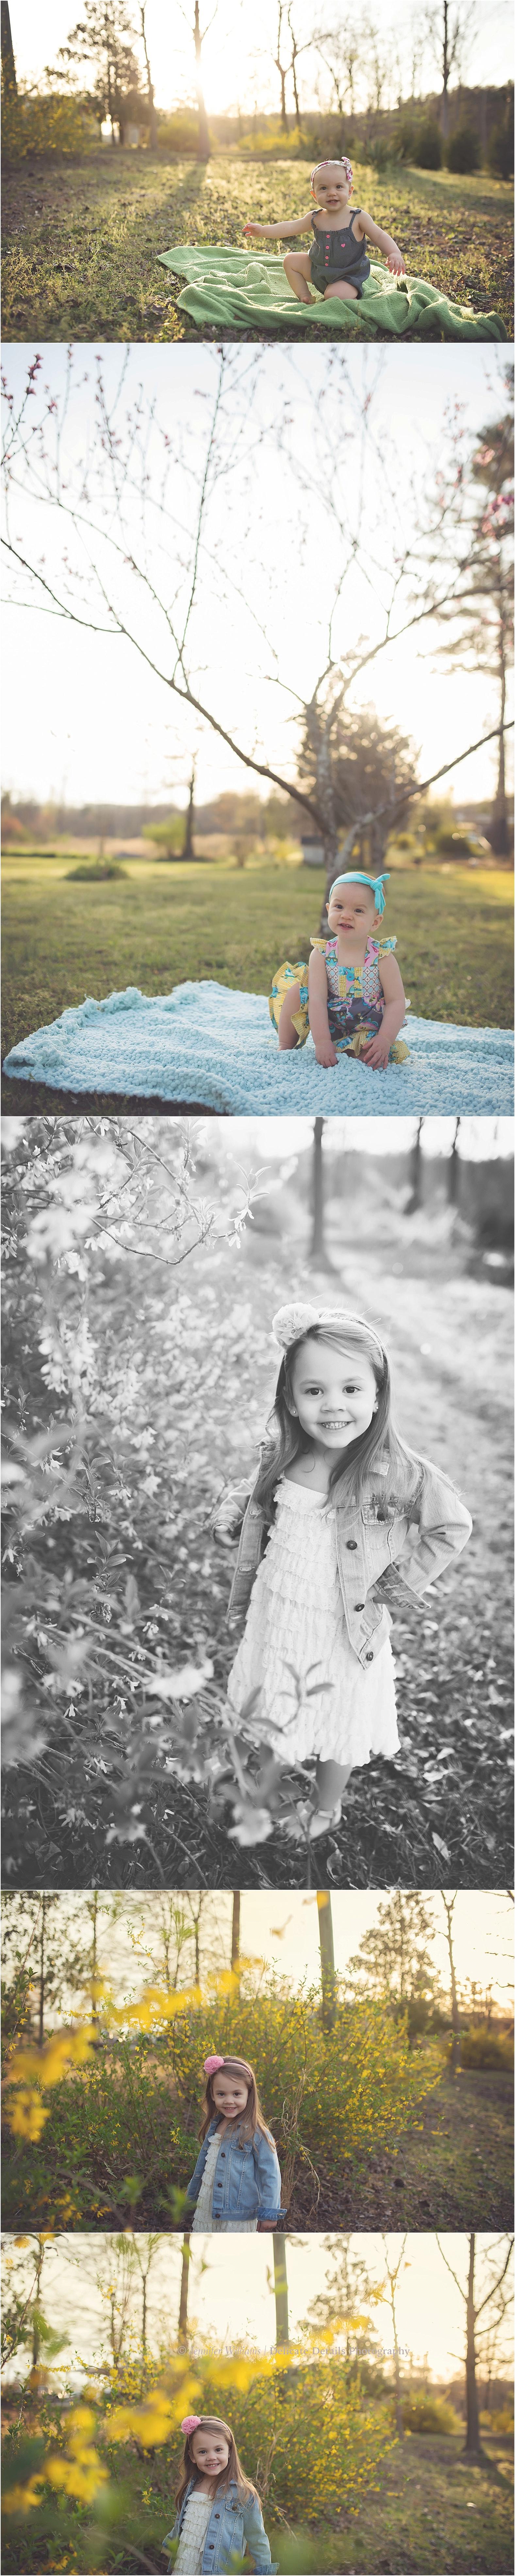 Jennifer Williams | Delicate Details Photography_0299.jpg